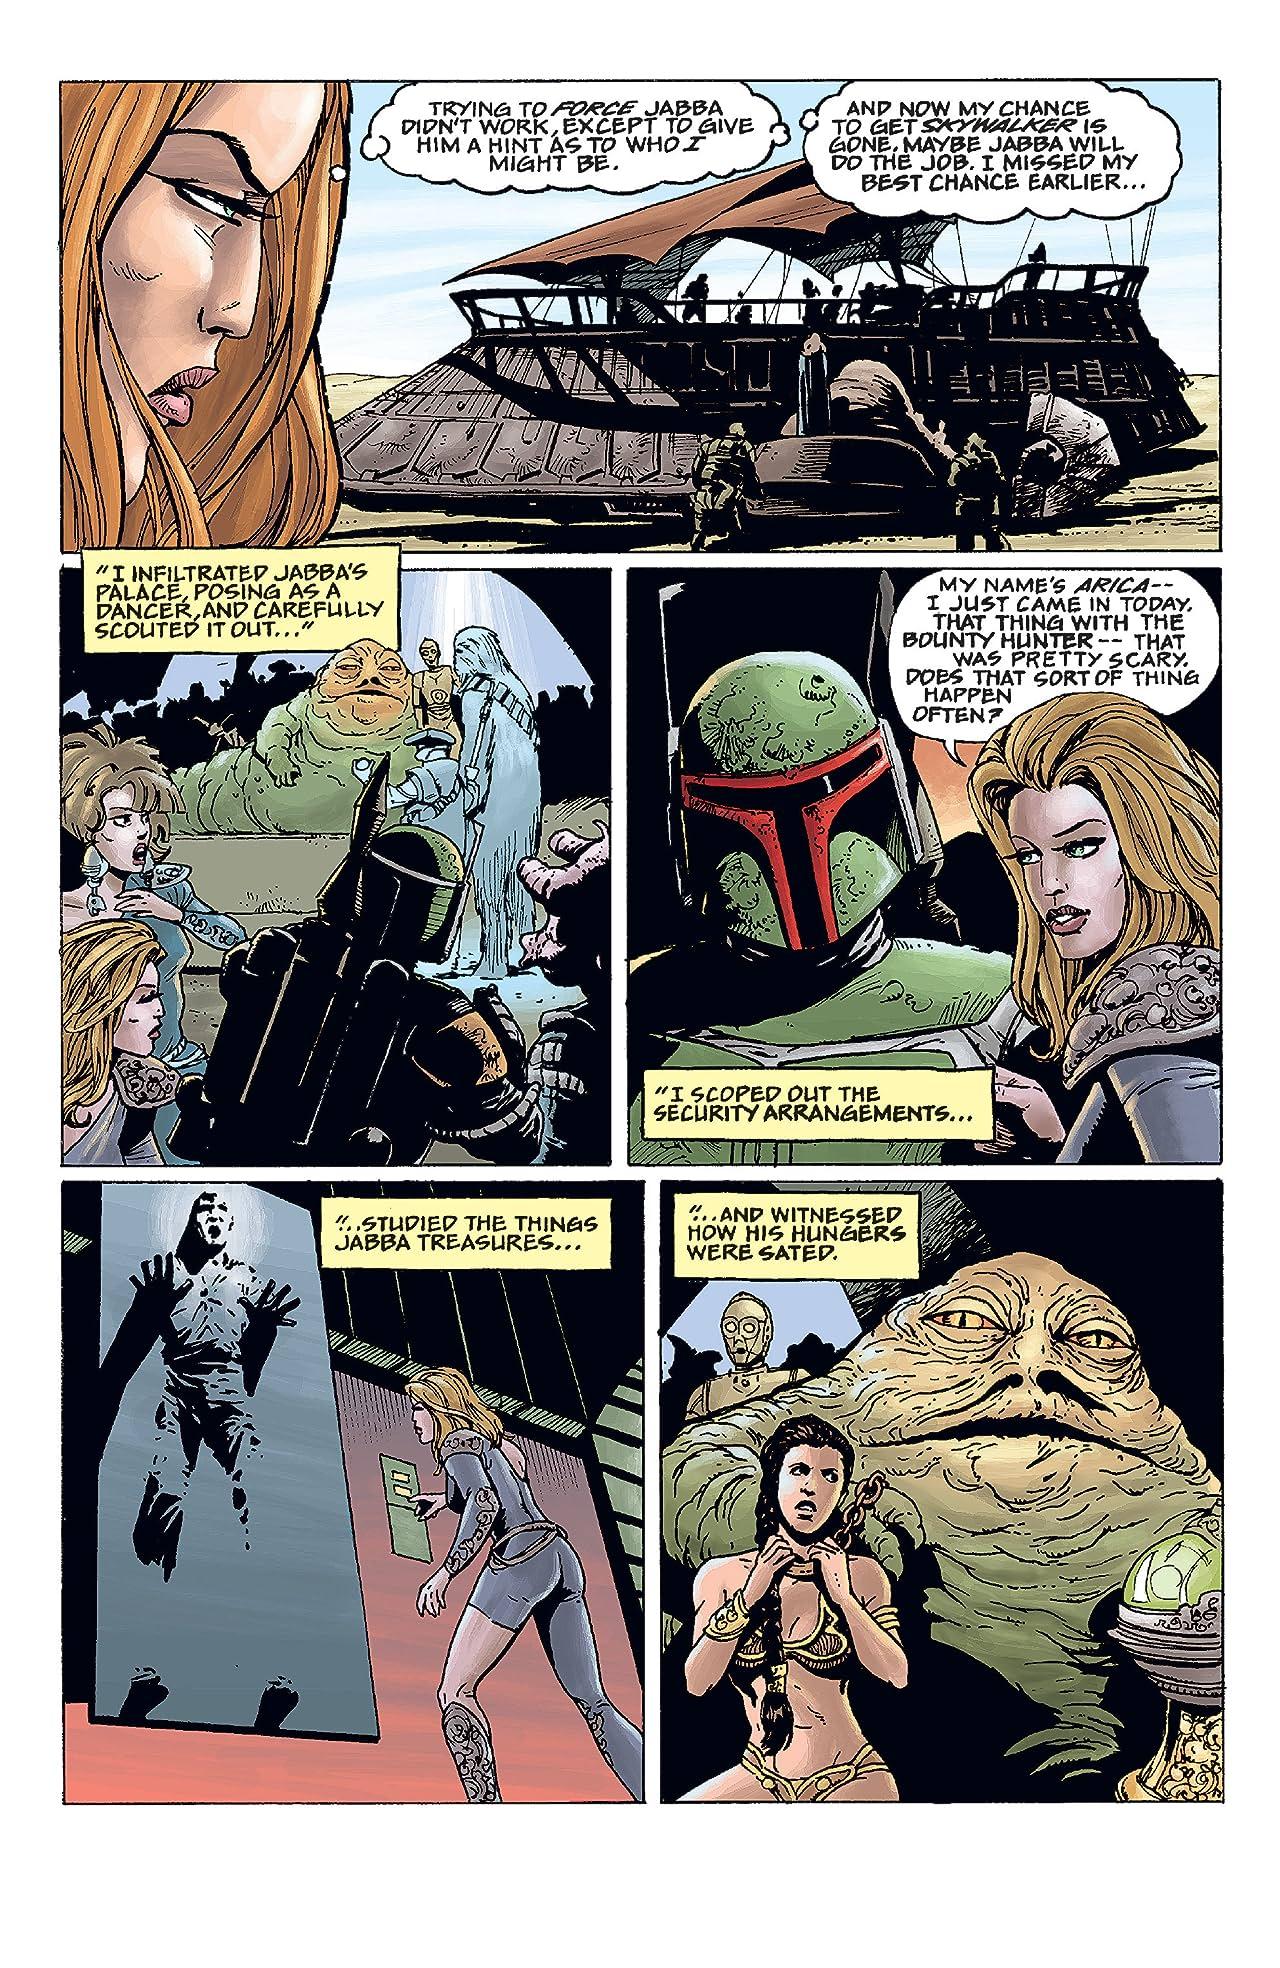 Star Wars: Mara Jade - By The Emperor's Hand (1998-1999) #1 (of 6)